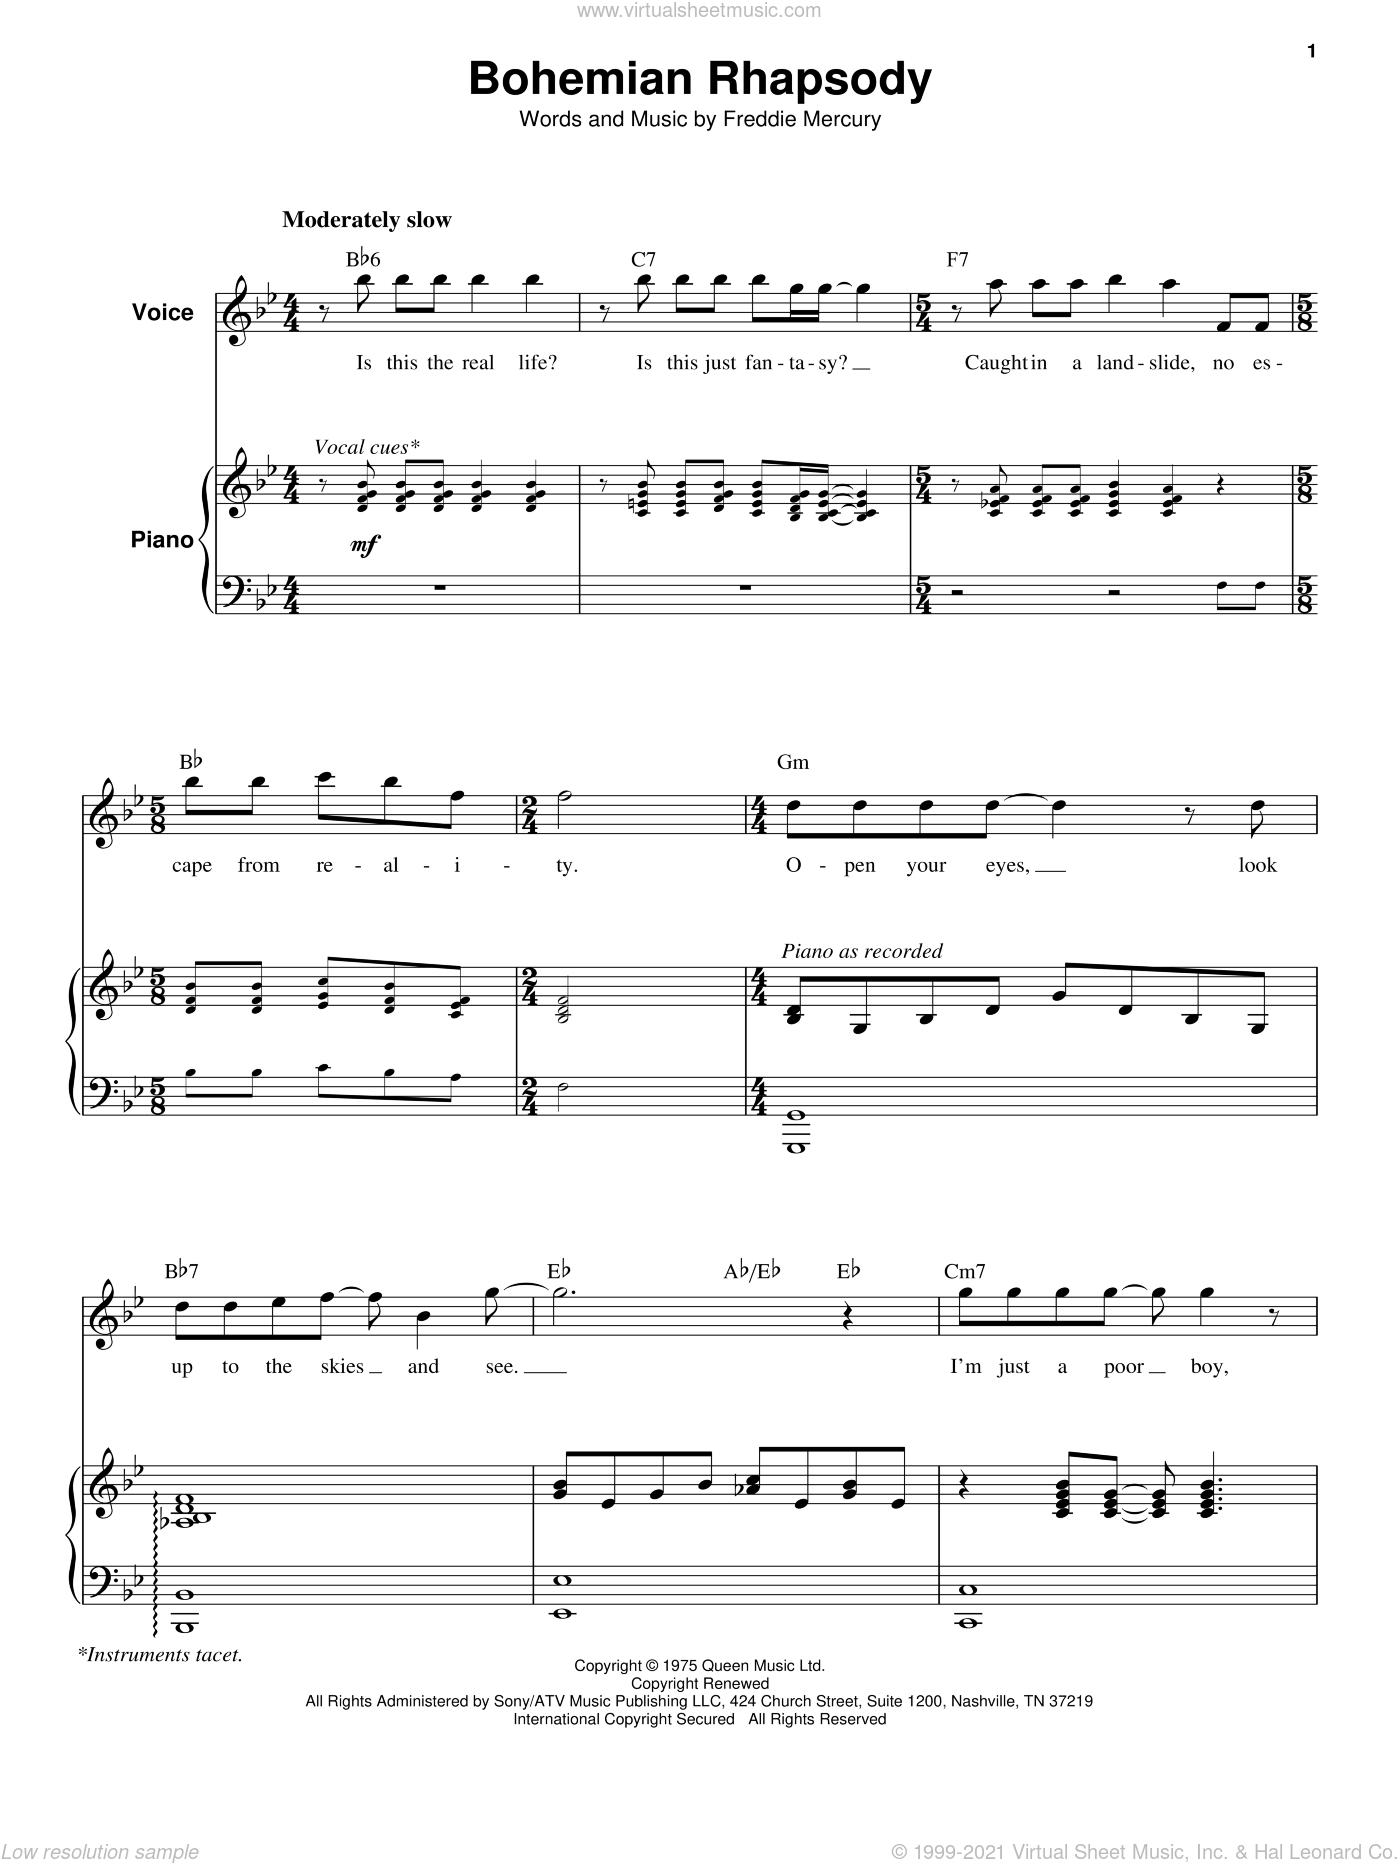 Bohemian rhapsody piano accompaniment pdf